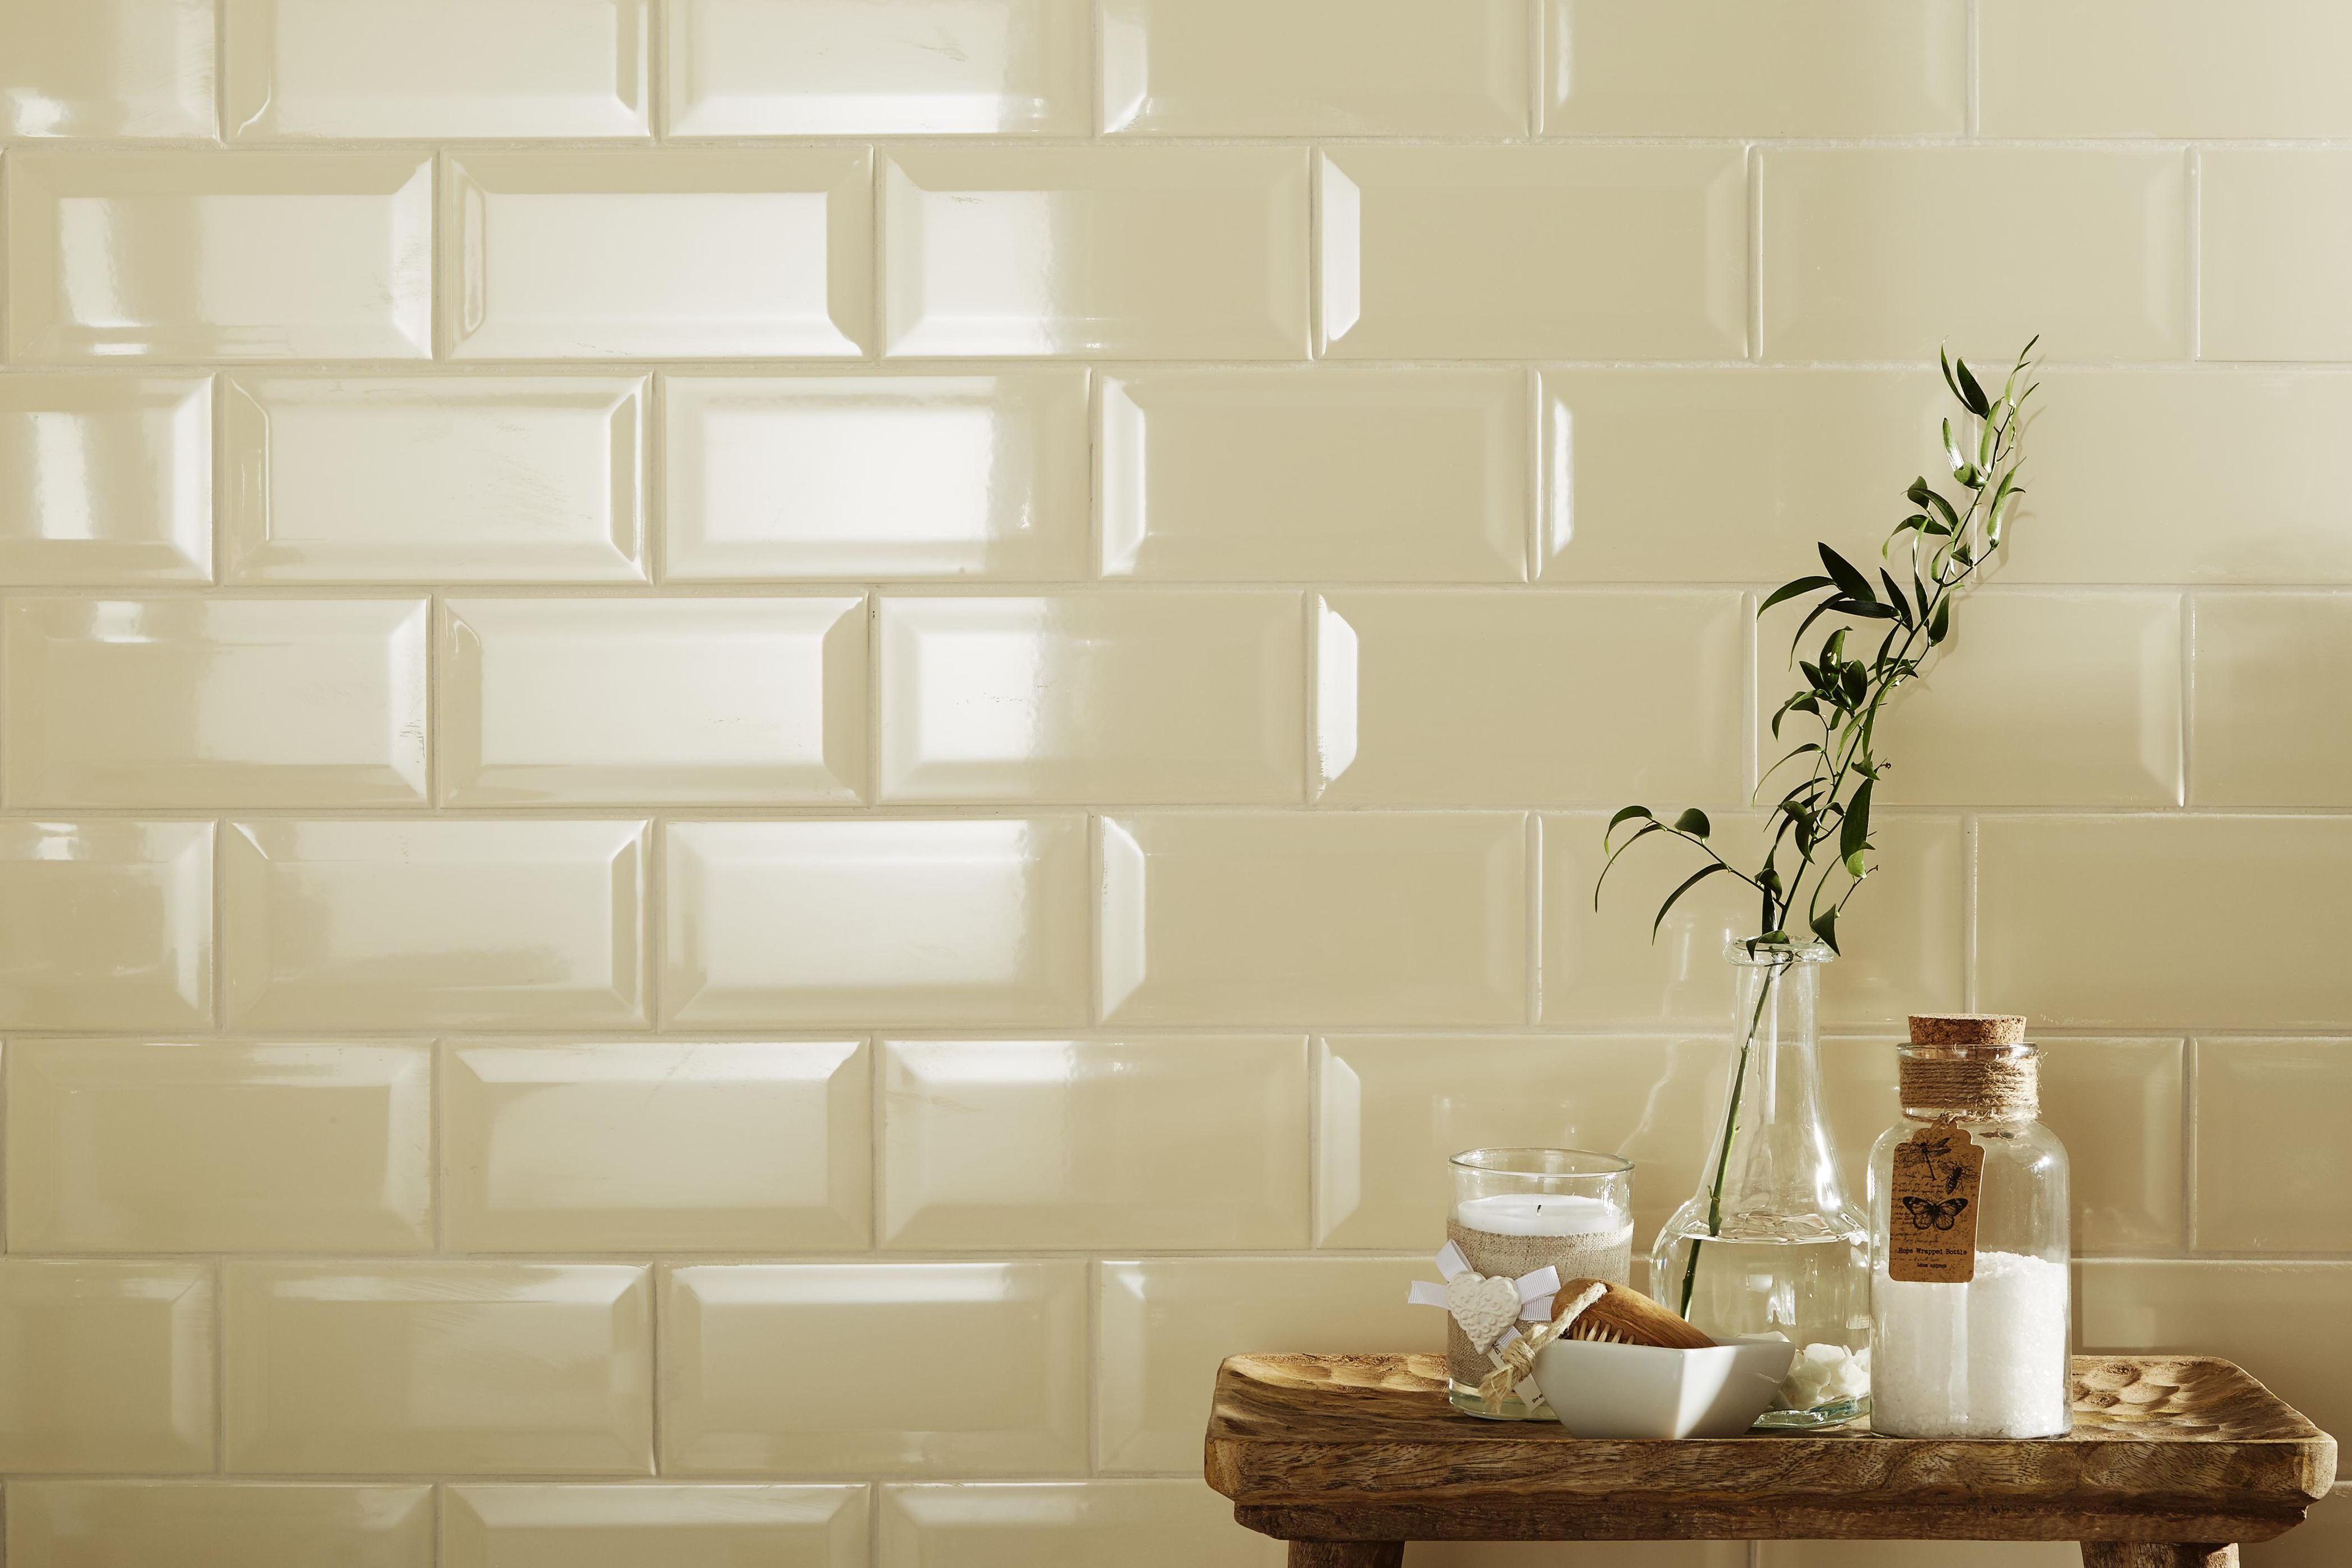 Kitchen Tiles B Q tiles | wall tiles & flooring